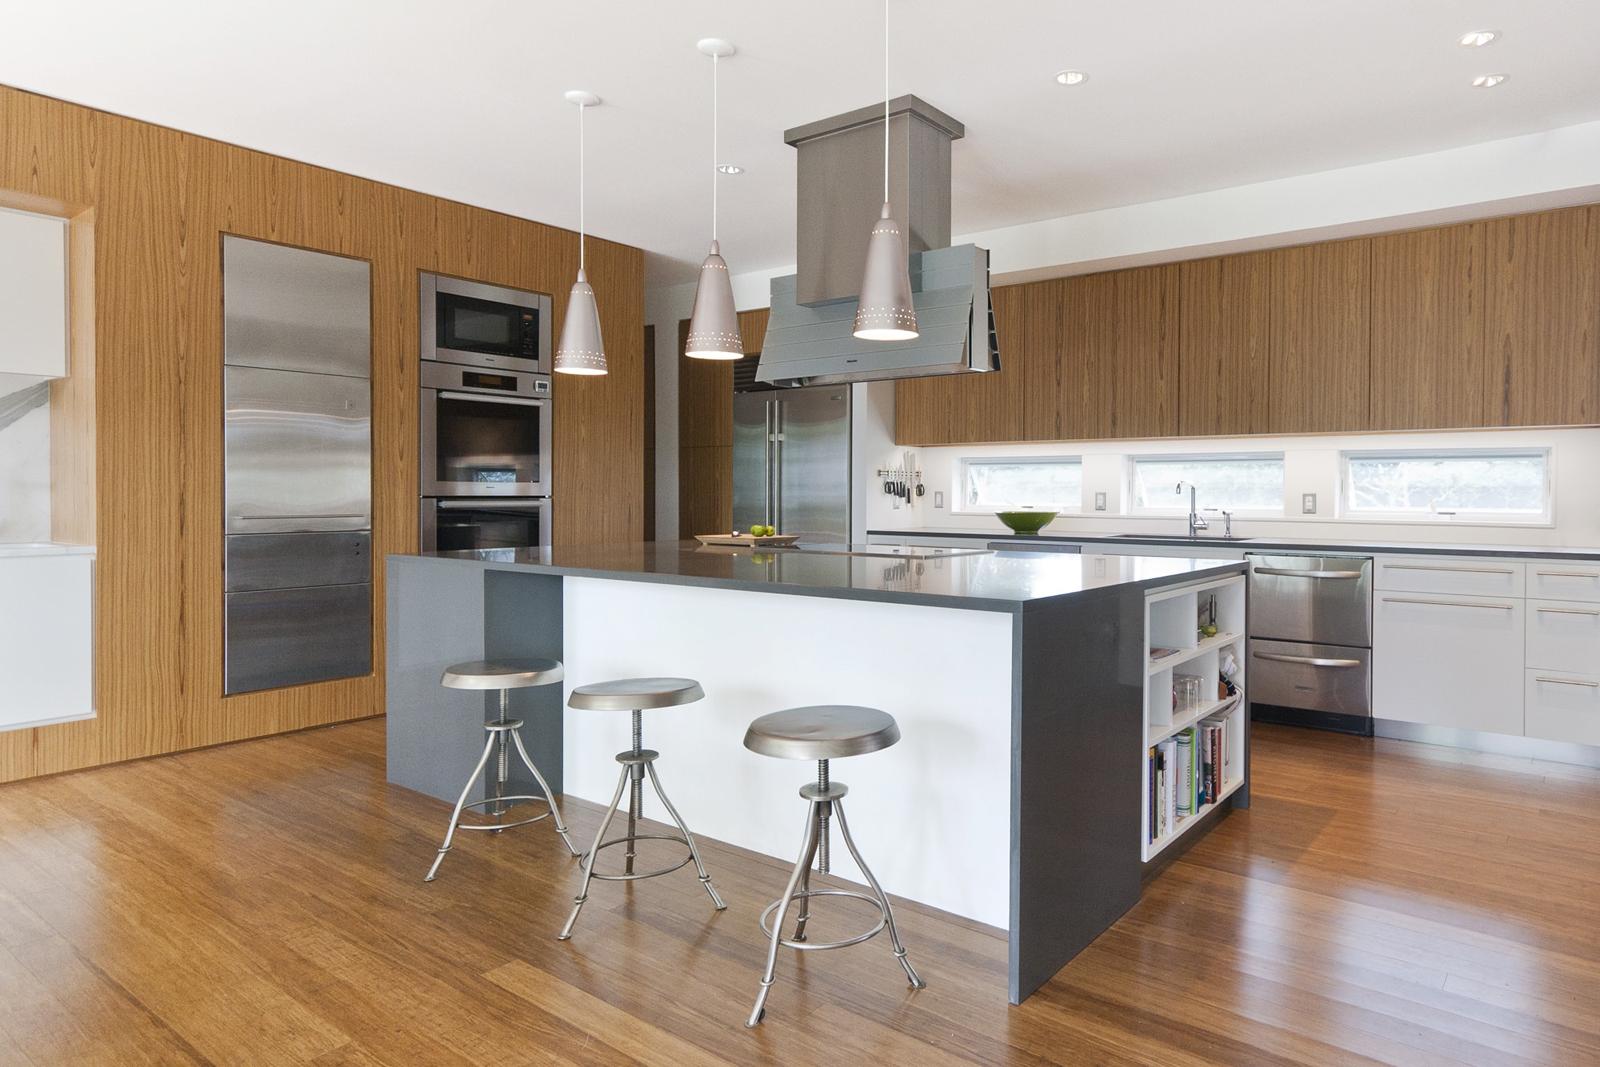 14-res4-resolution-4-architecture-modern-modular-home-prefab-house-fishers-island-interior-kitchen-dining-island.jpg